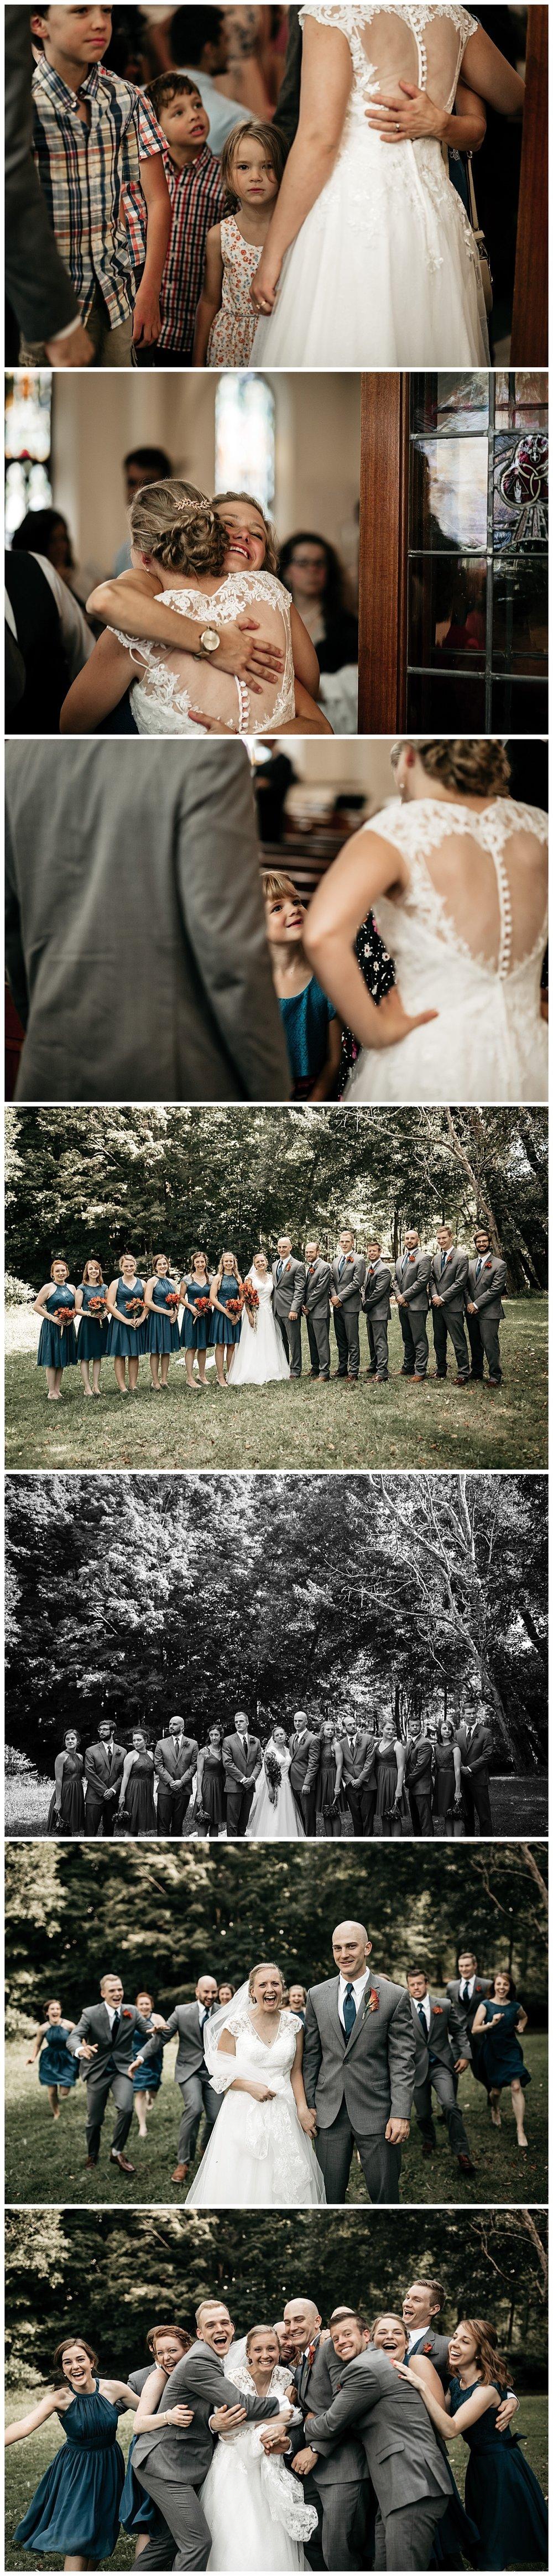 grovecitypabackyardweddingweddingphotographer_0006.jpg